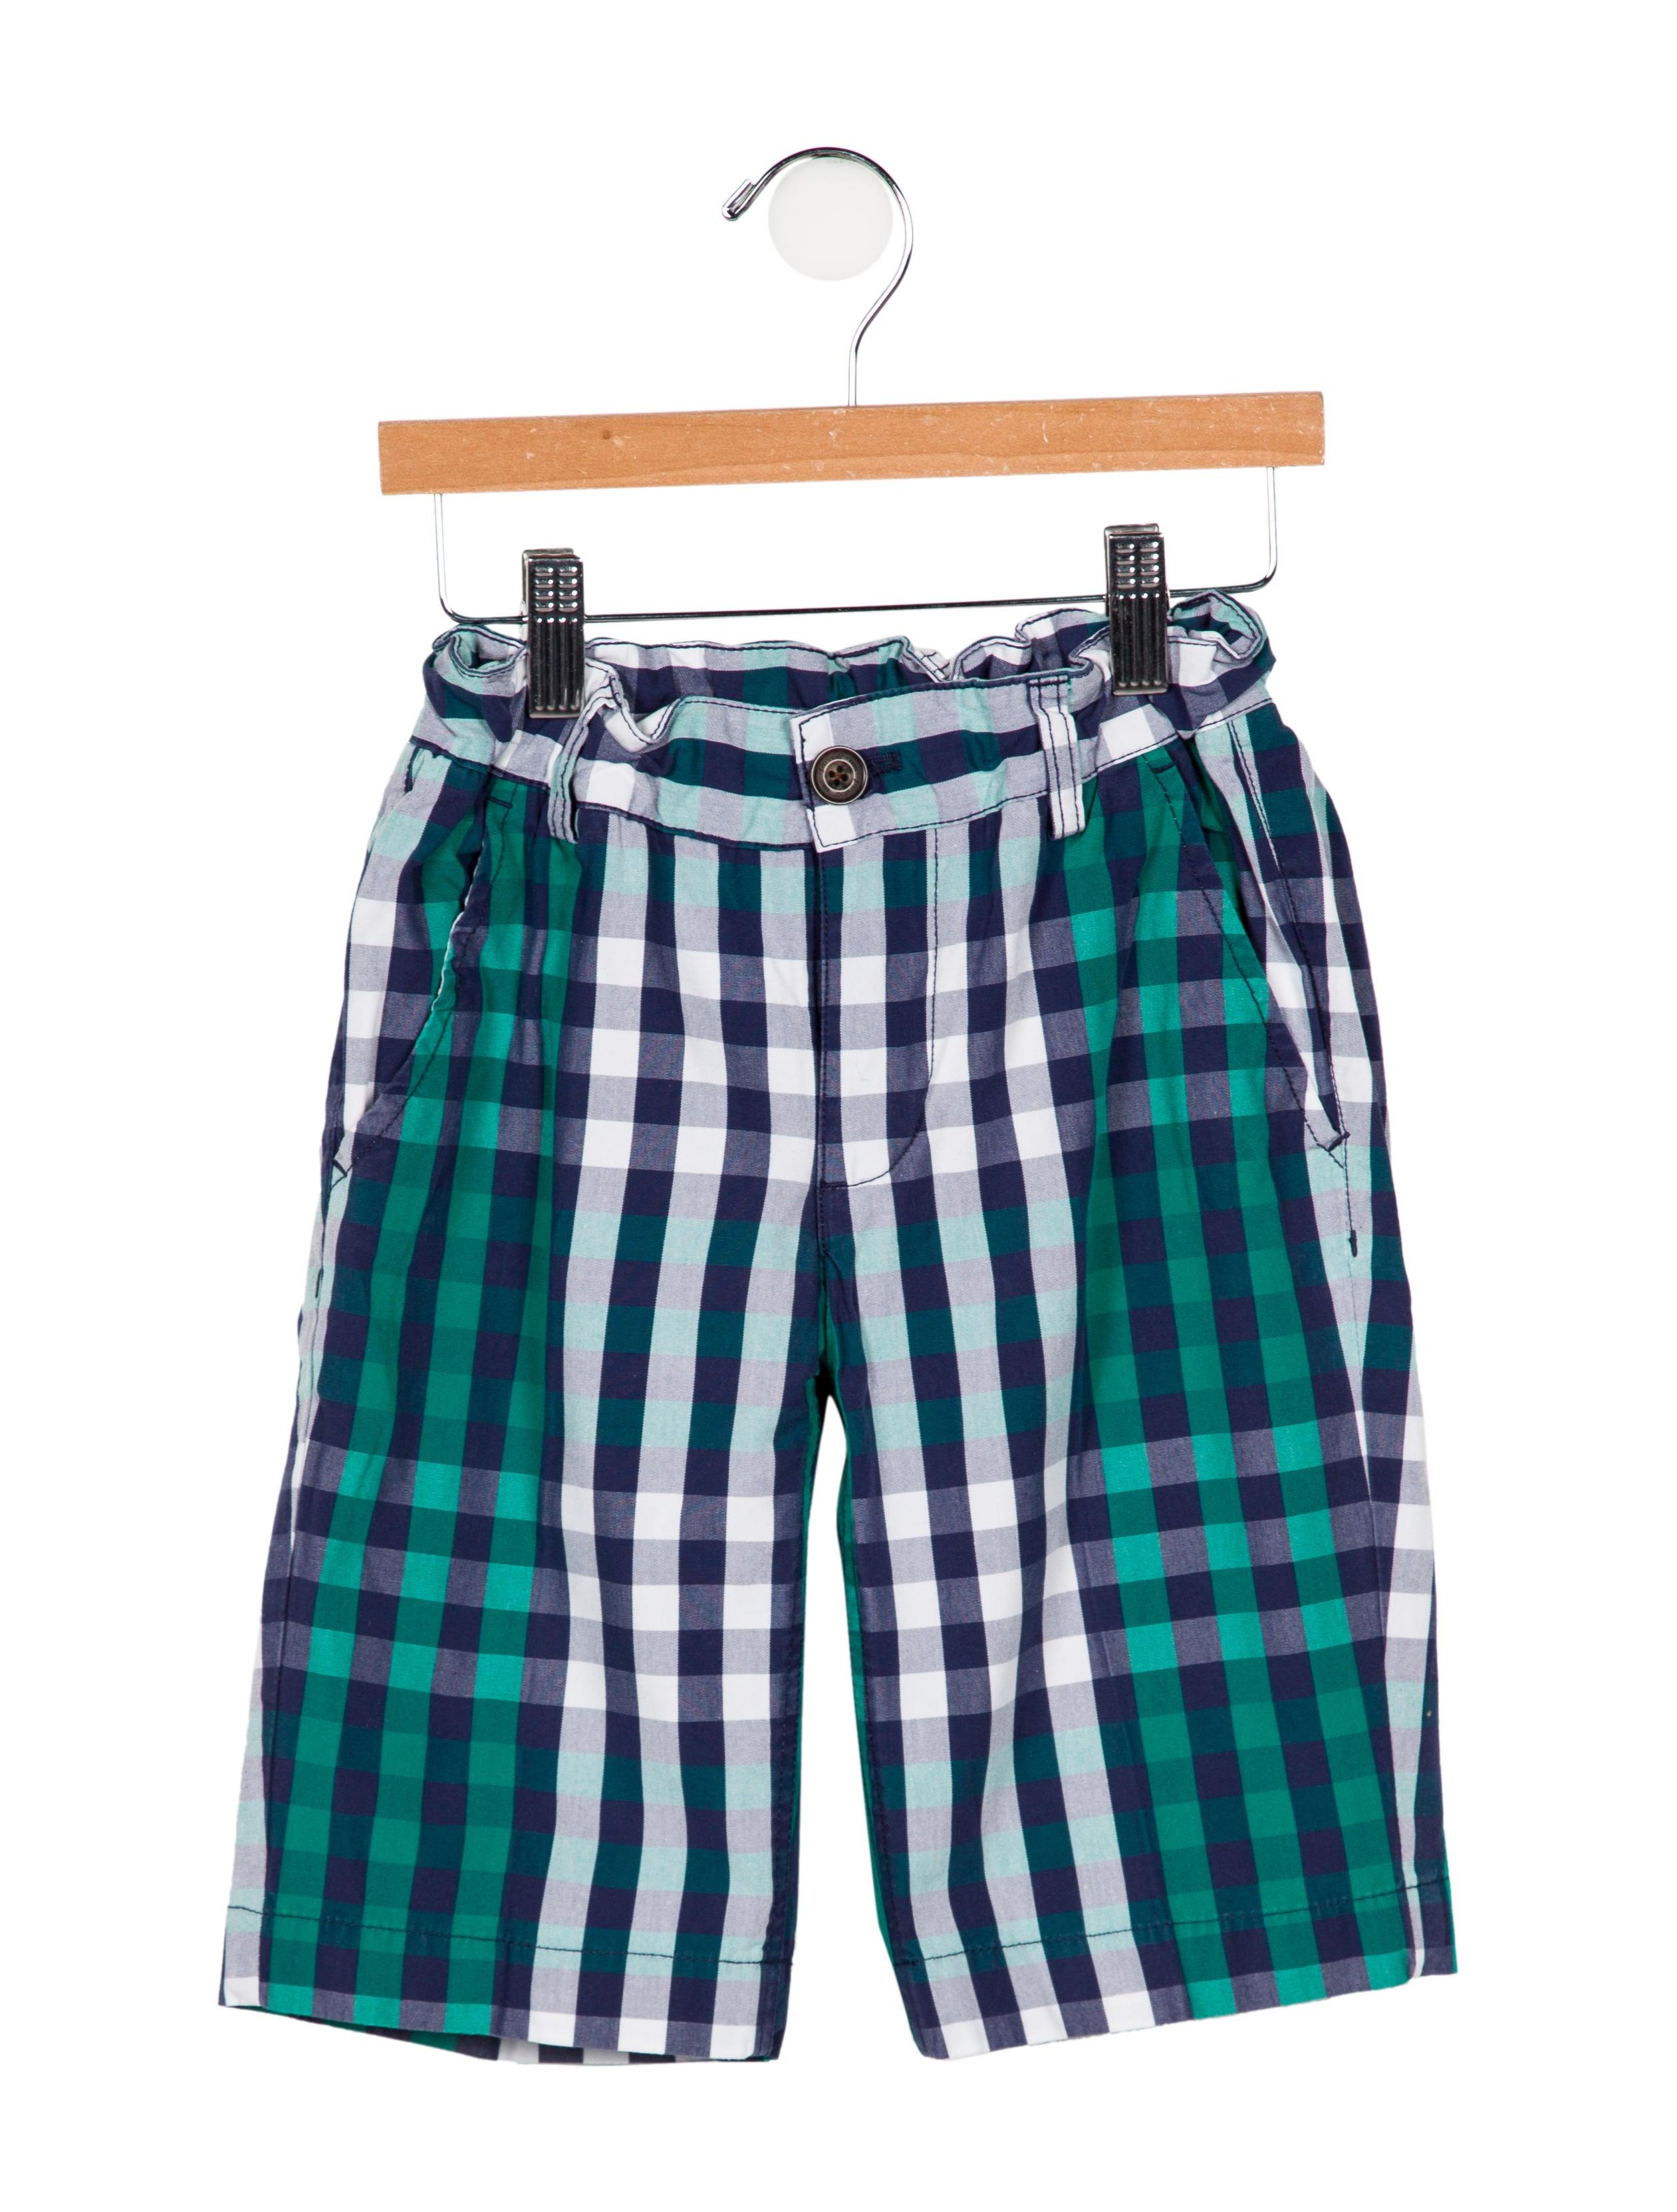 b850986209610 Jacadi Boys' Checkered Woven Shorts - Boys - WJDCI27942 | The RealReal